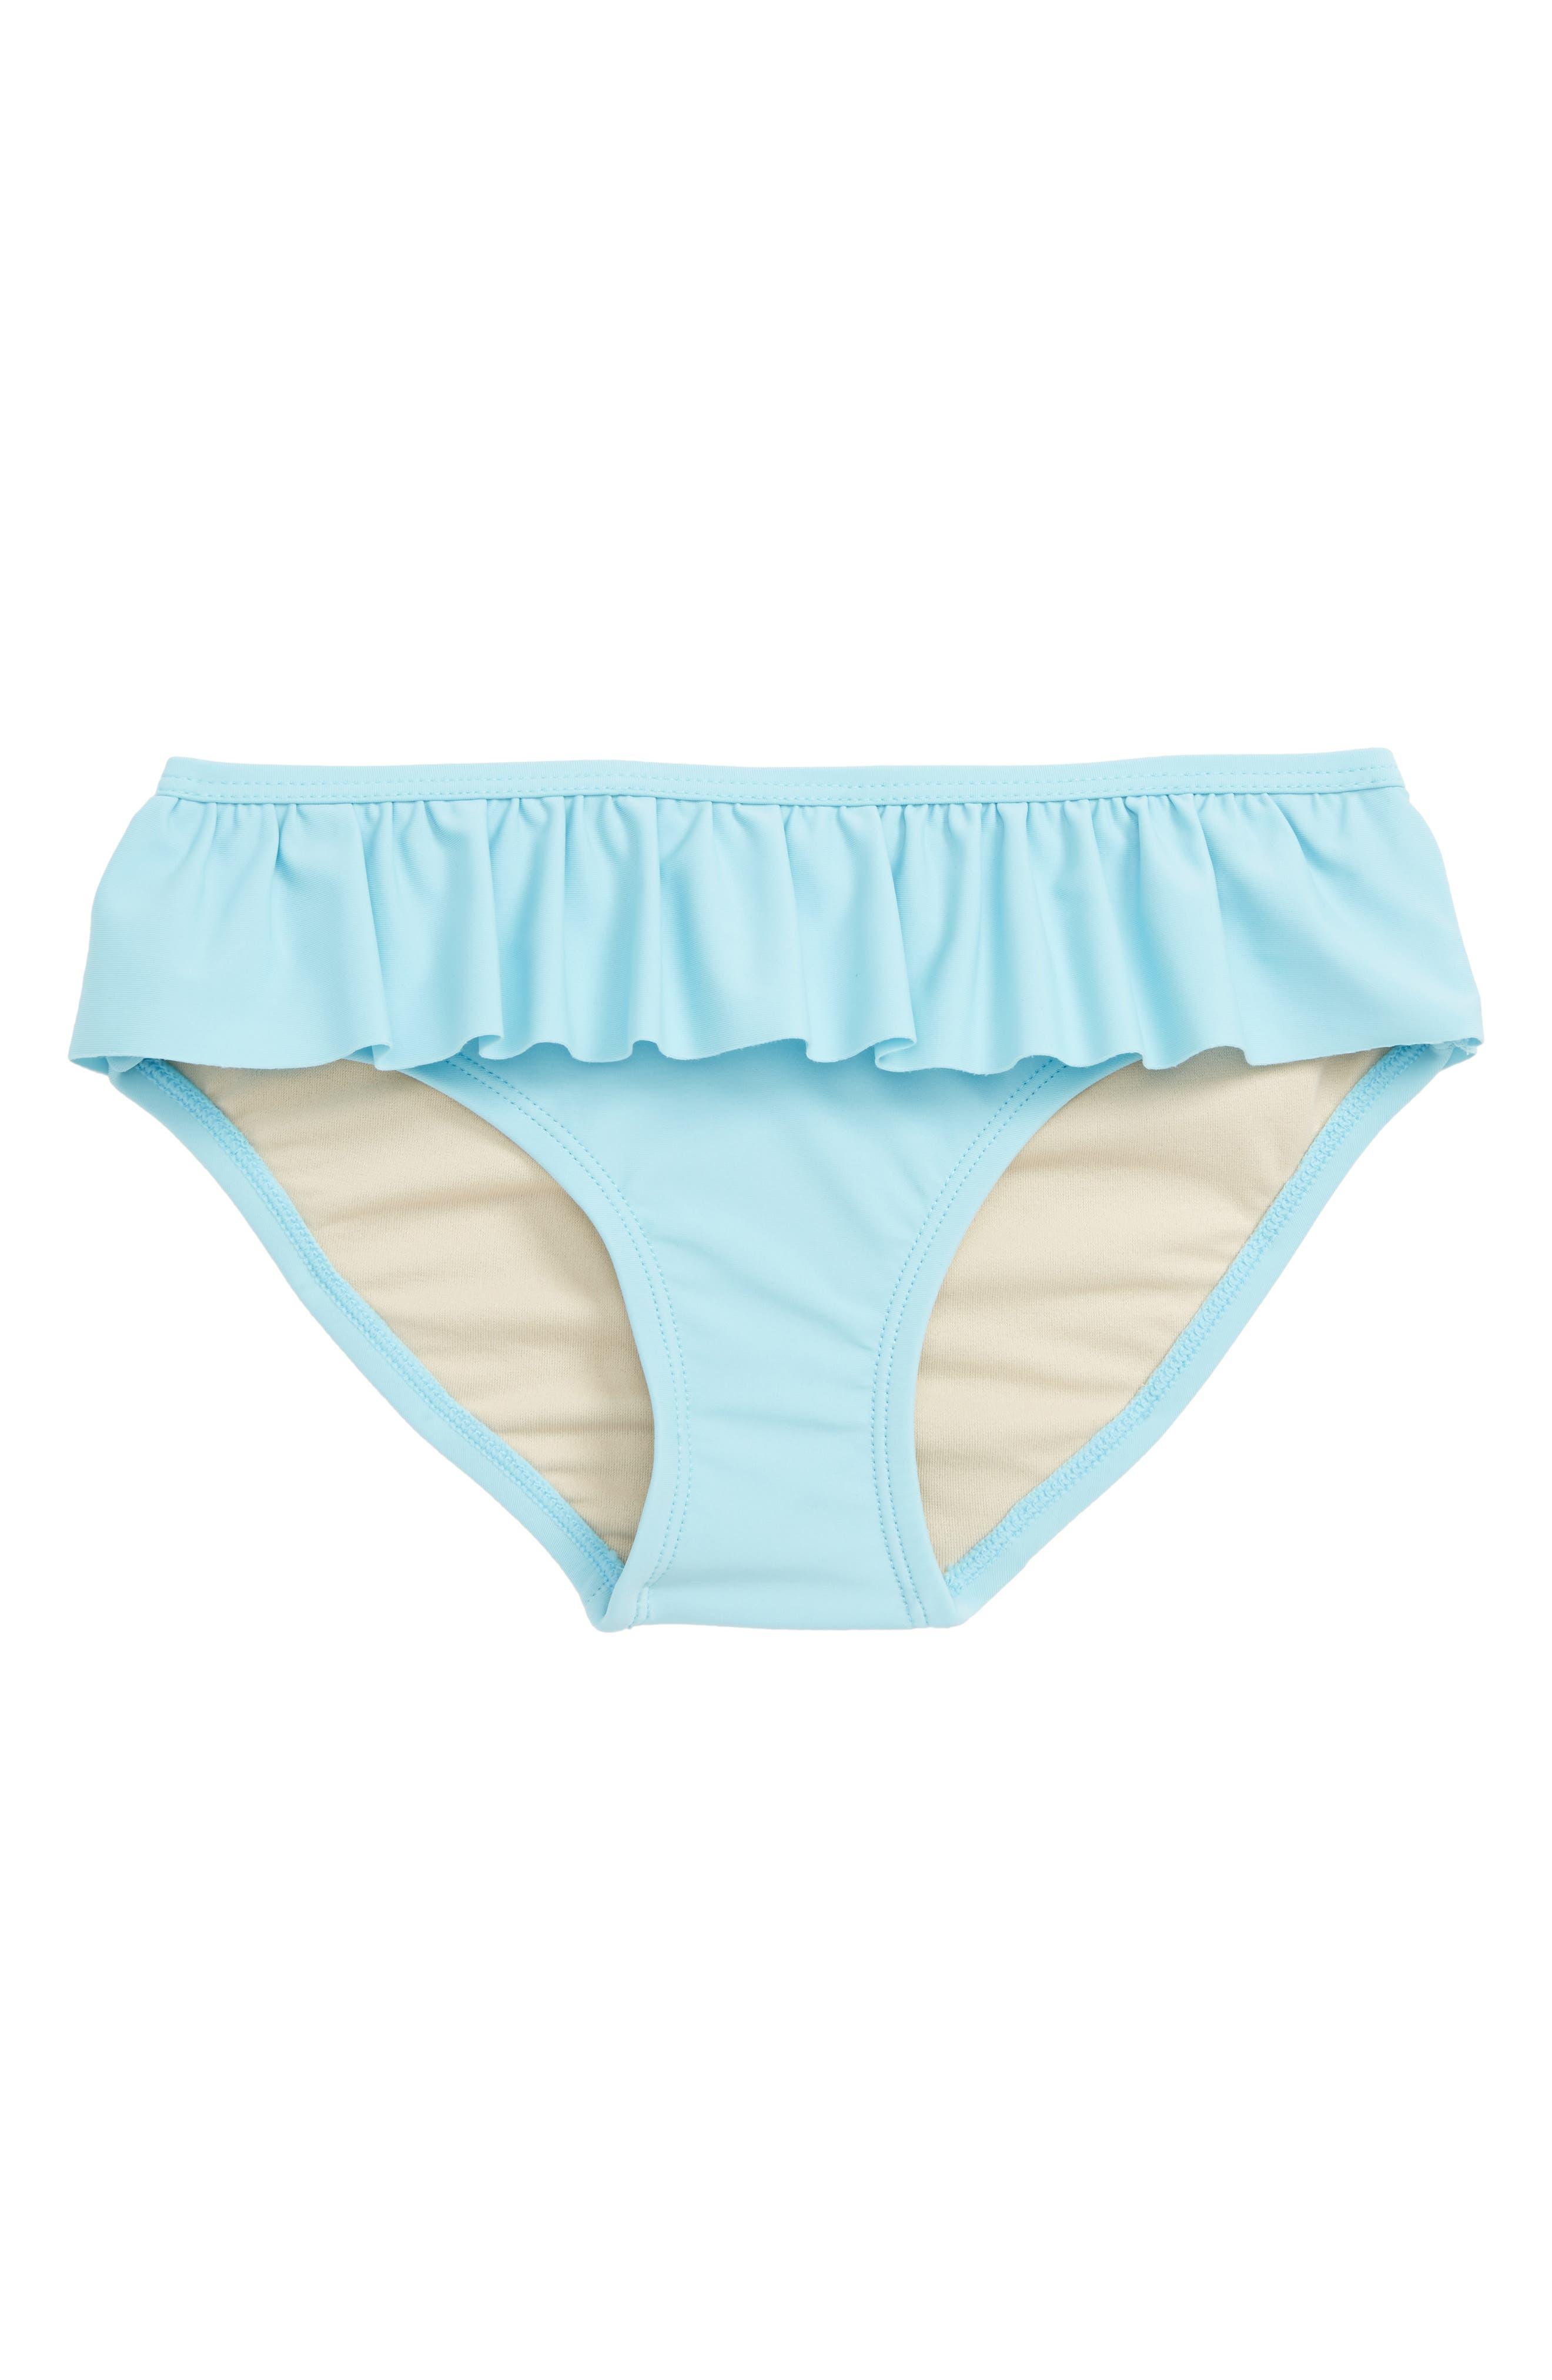 TEA COLLECTION Ruffle Bikini Bottoms, Main, color, ROBINS EGG